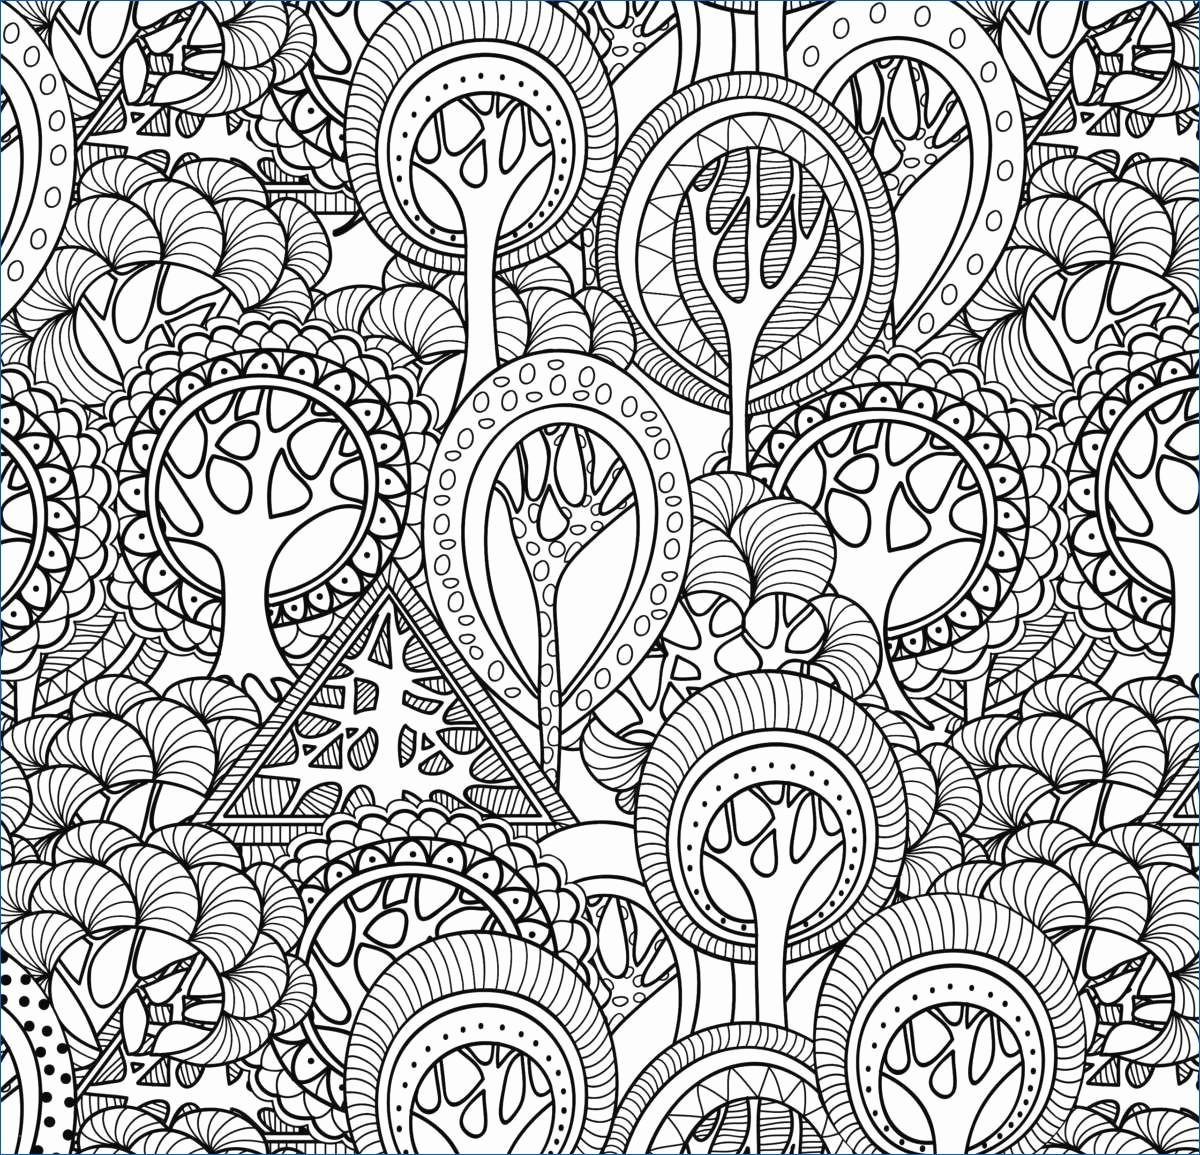 Ninjago Ausmalbilder Lord Garmadon Genial Coloring Page Net Admirably Ninjago Ausmalbilder Lord Garmadon Das Bild